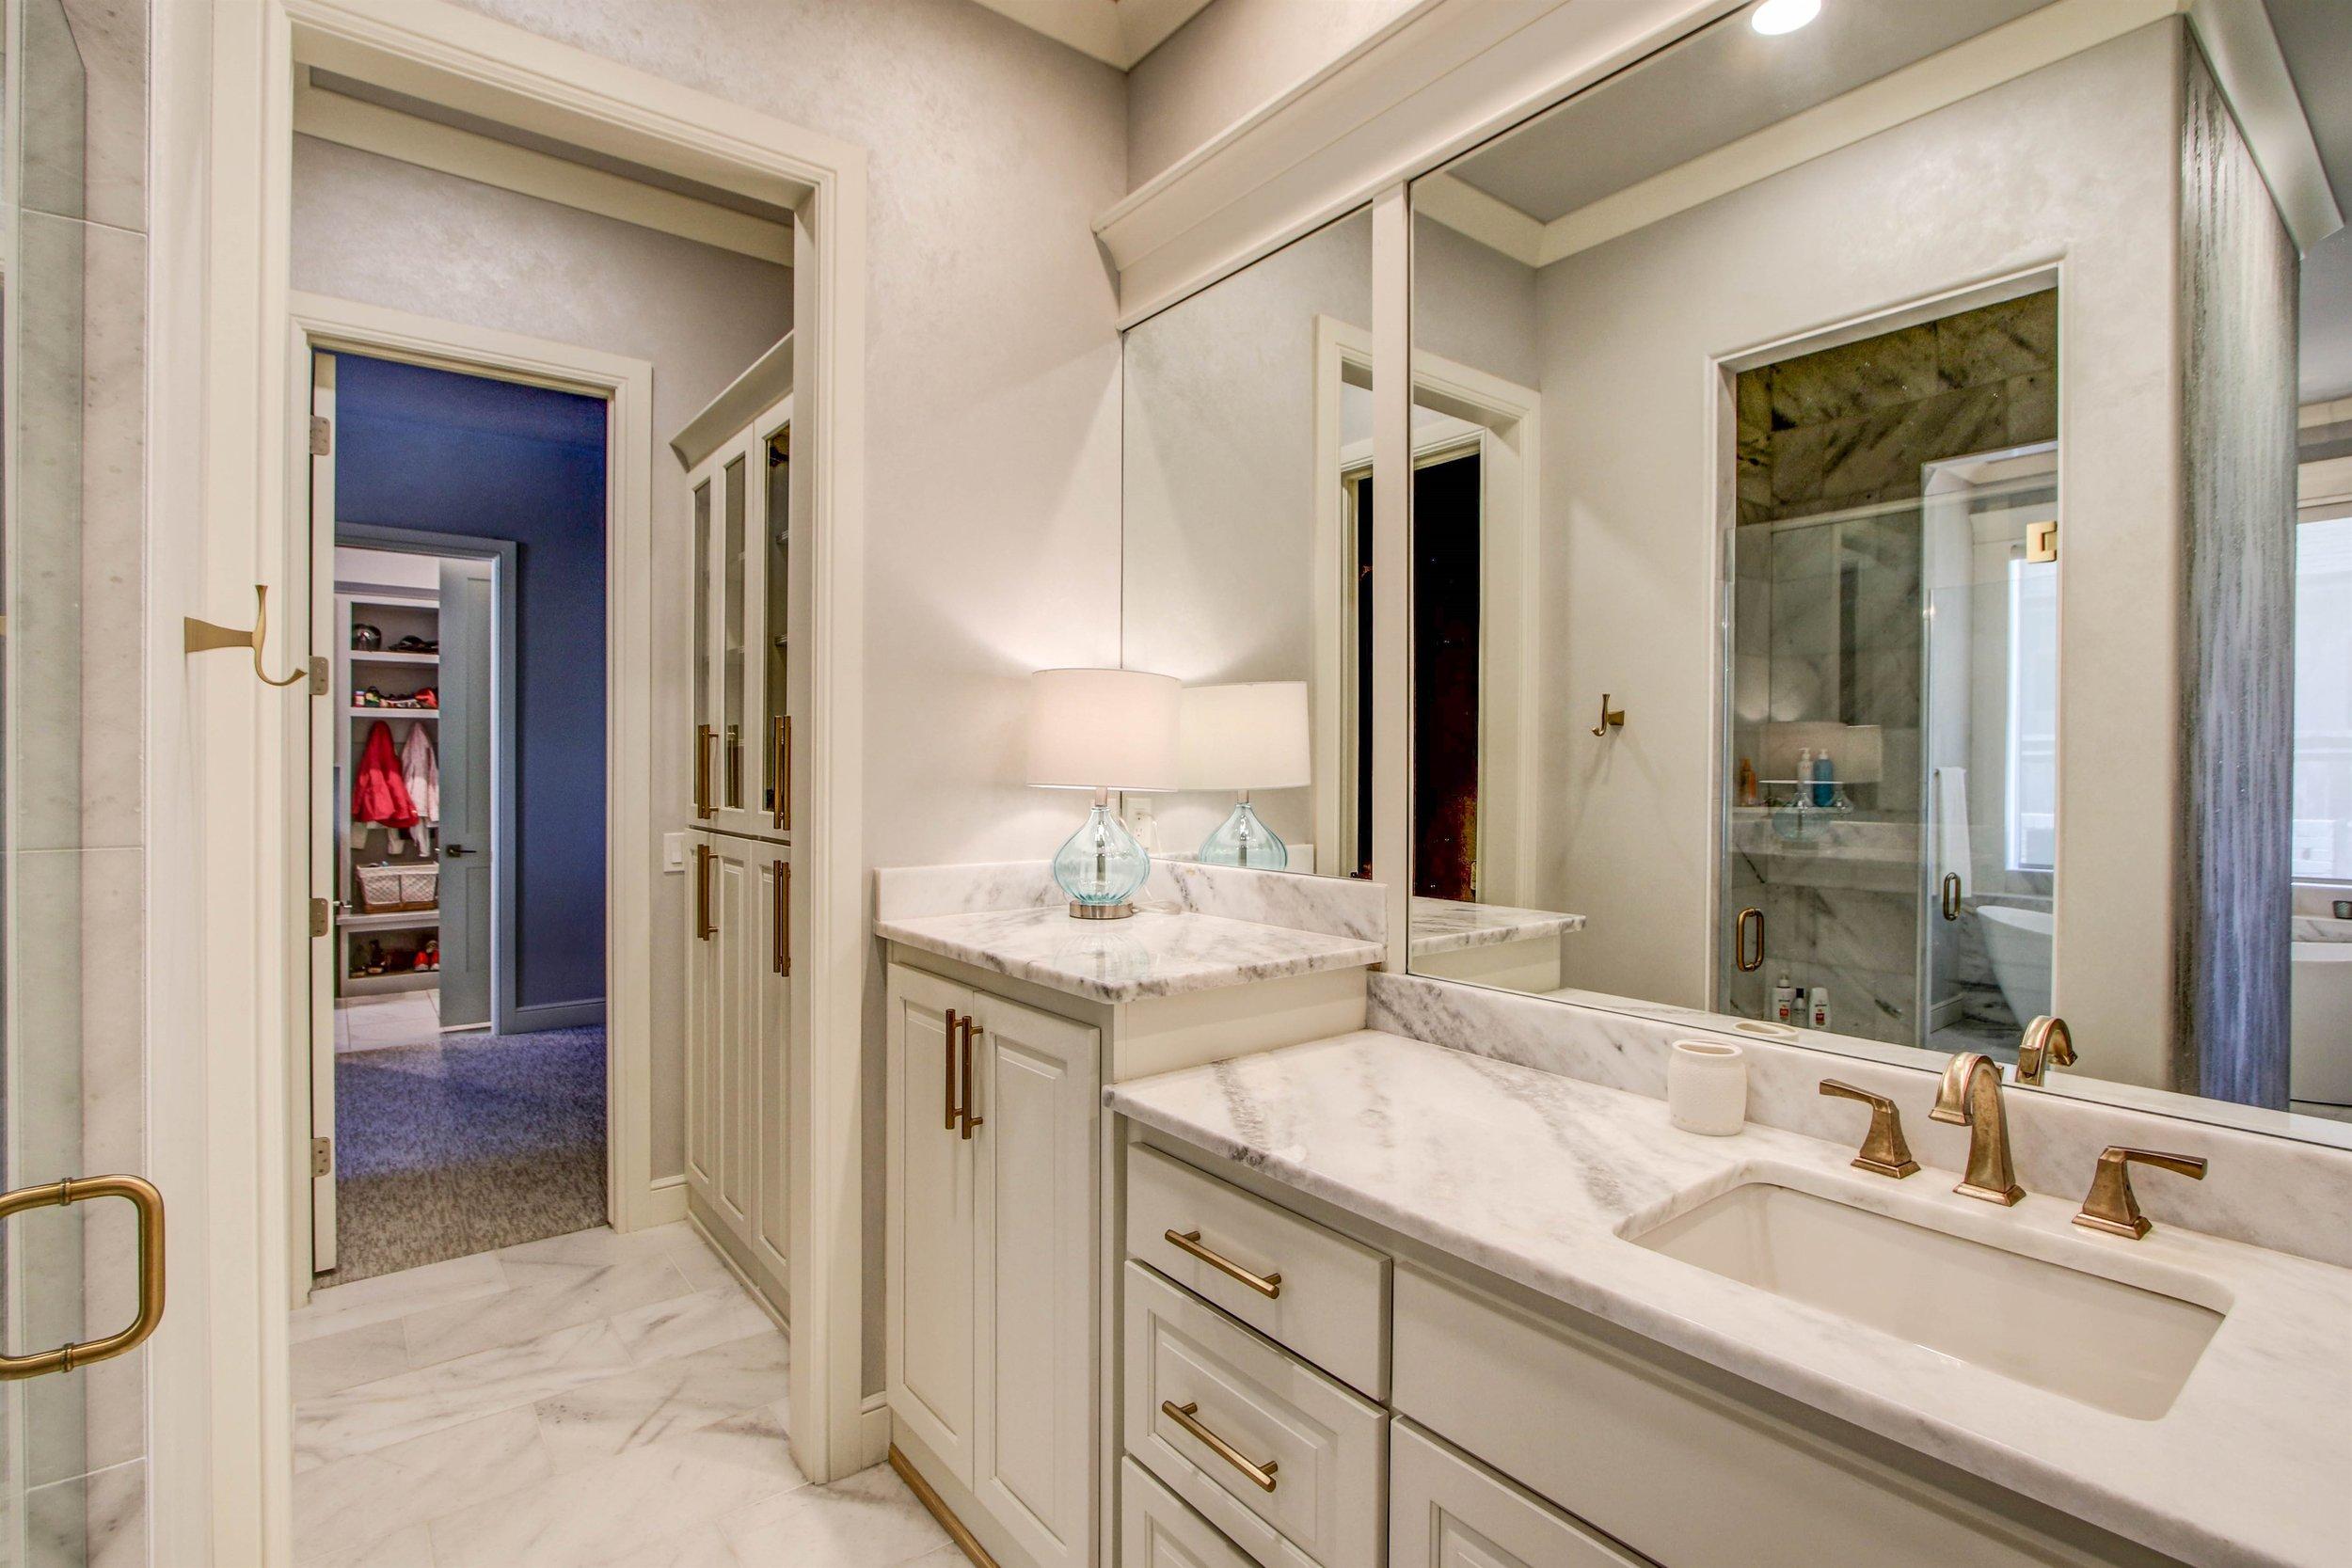 014_Master Bathroom.jpg